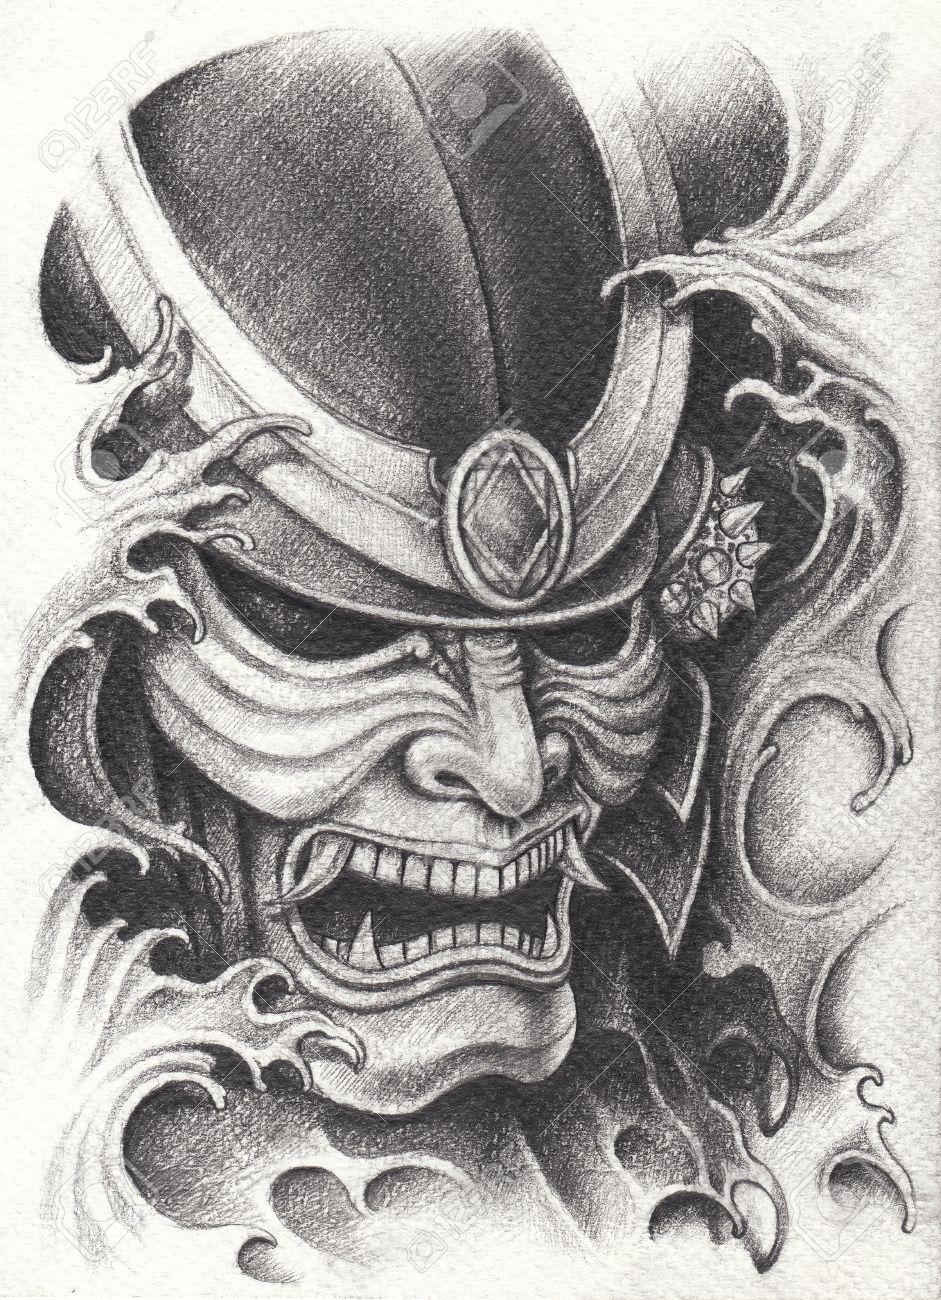 Diseño Del Tatuaje Del Guerrero Del Samurai Dibujo De Lápiz De Mano